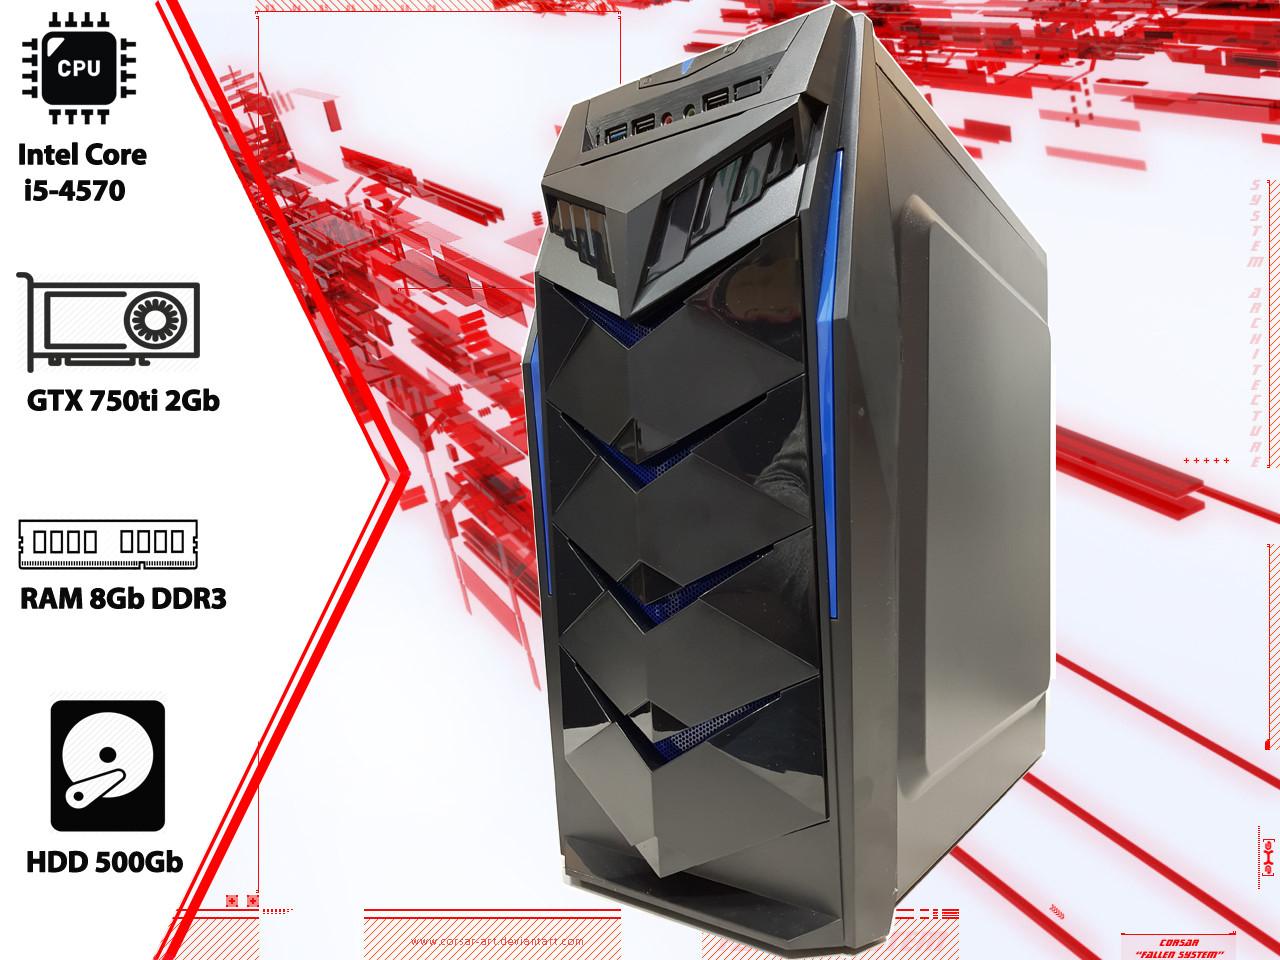 Игровой ПК Intel Core i5 4570, GTX 750ti, DDR3 8Gb, 500Gb